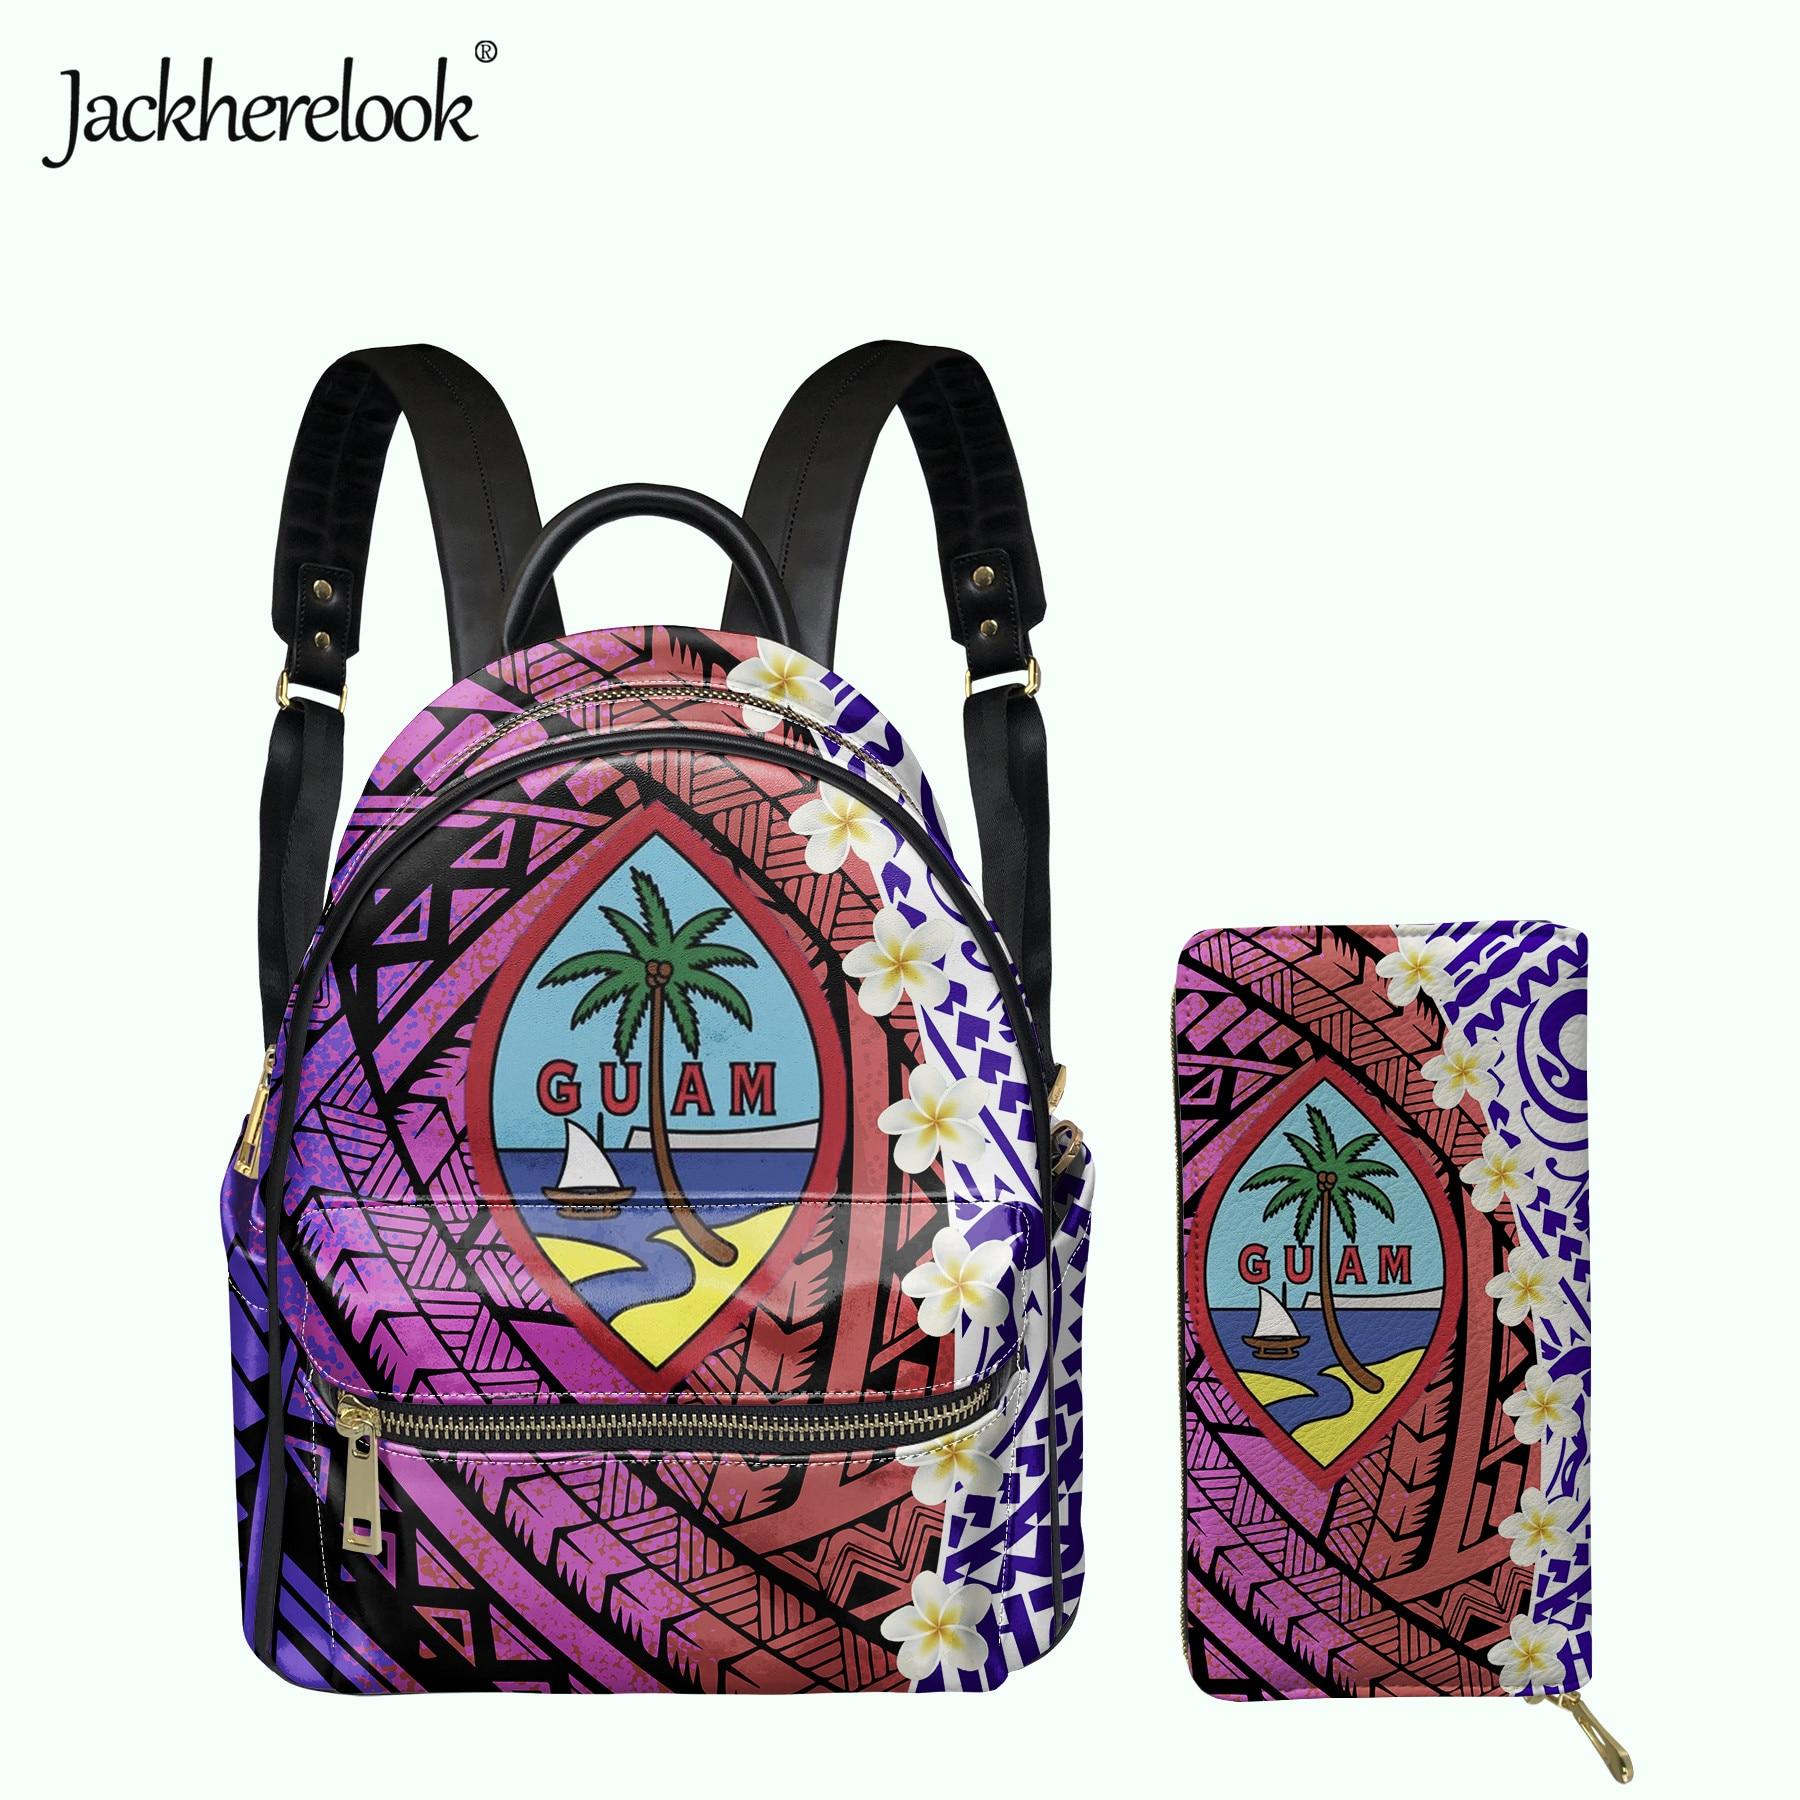 Jackherelook المرأة باكباك غوام بلاميريا بولينيزيا نمط الإناث حقيبة محفظة حمل بطاقات مجموعة الفتيات حقيبة مدرسية صغيرة Mochila